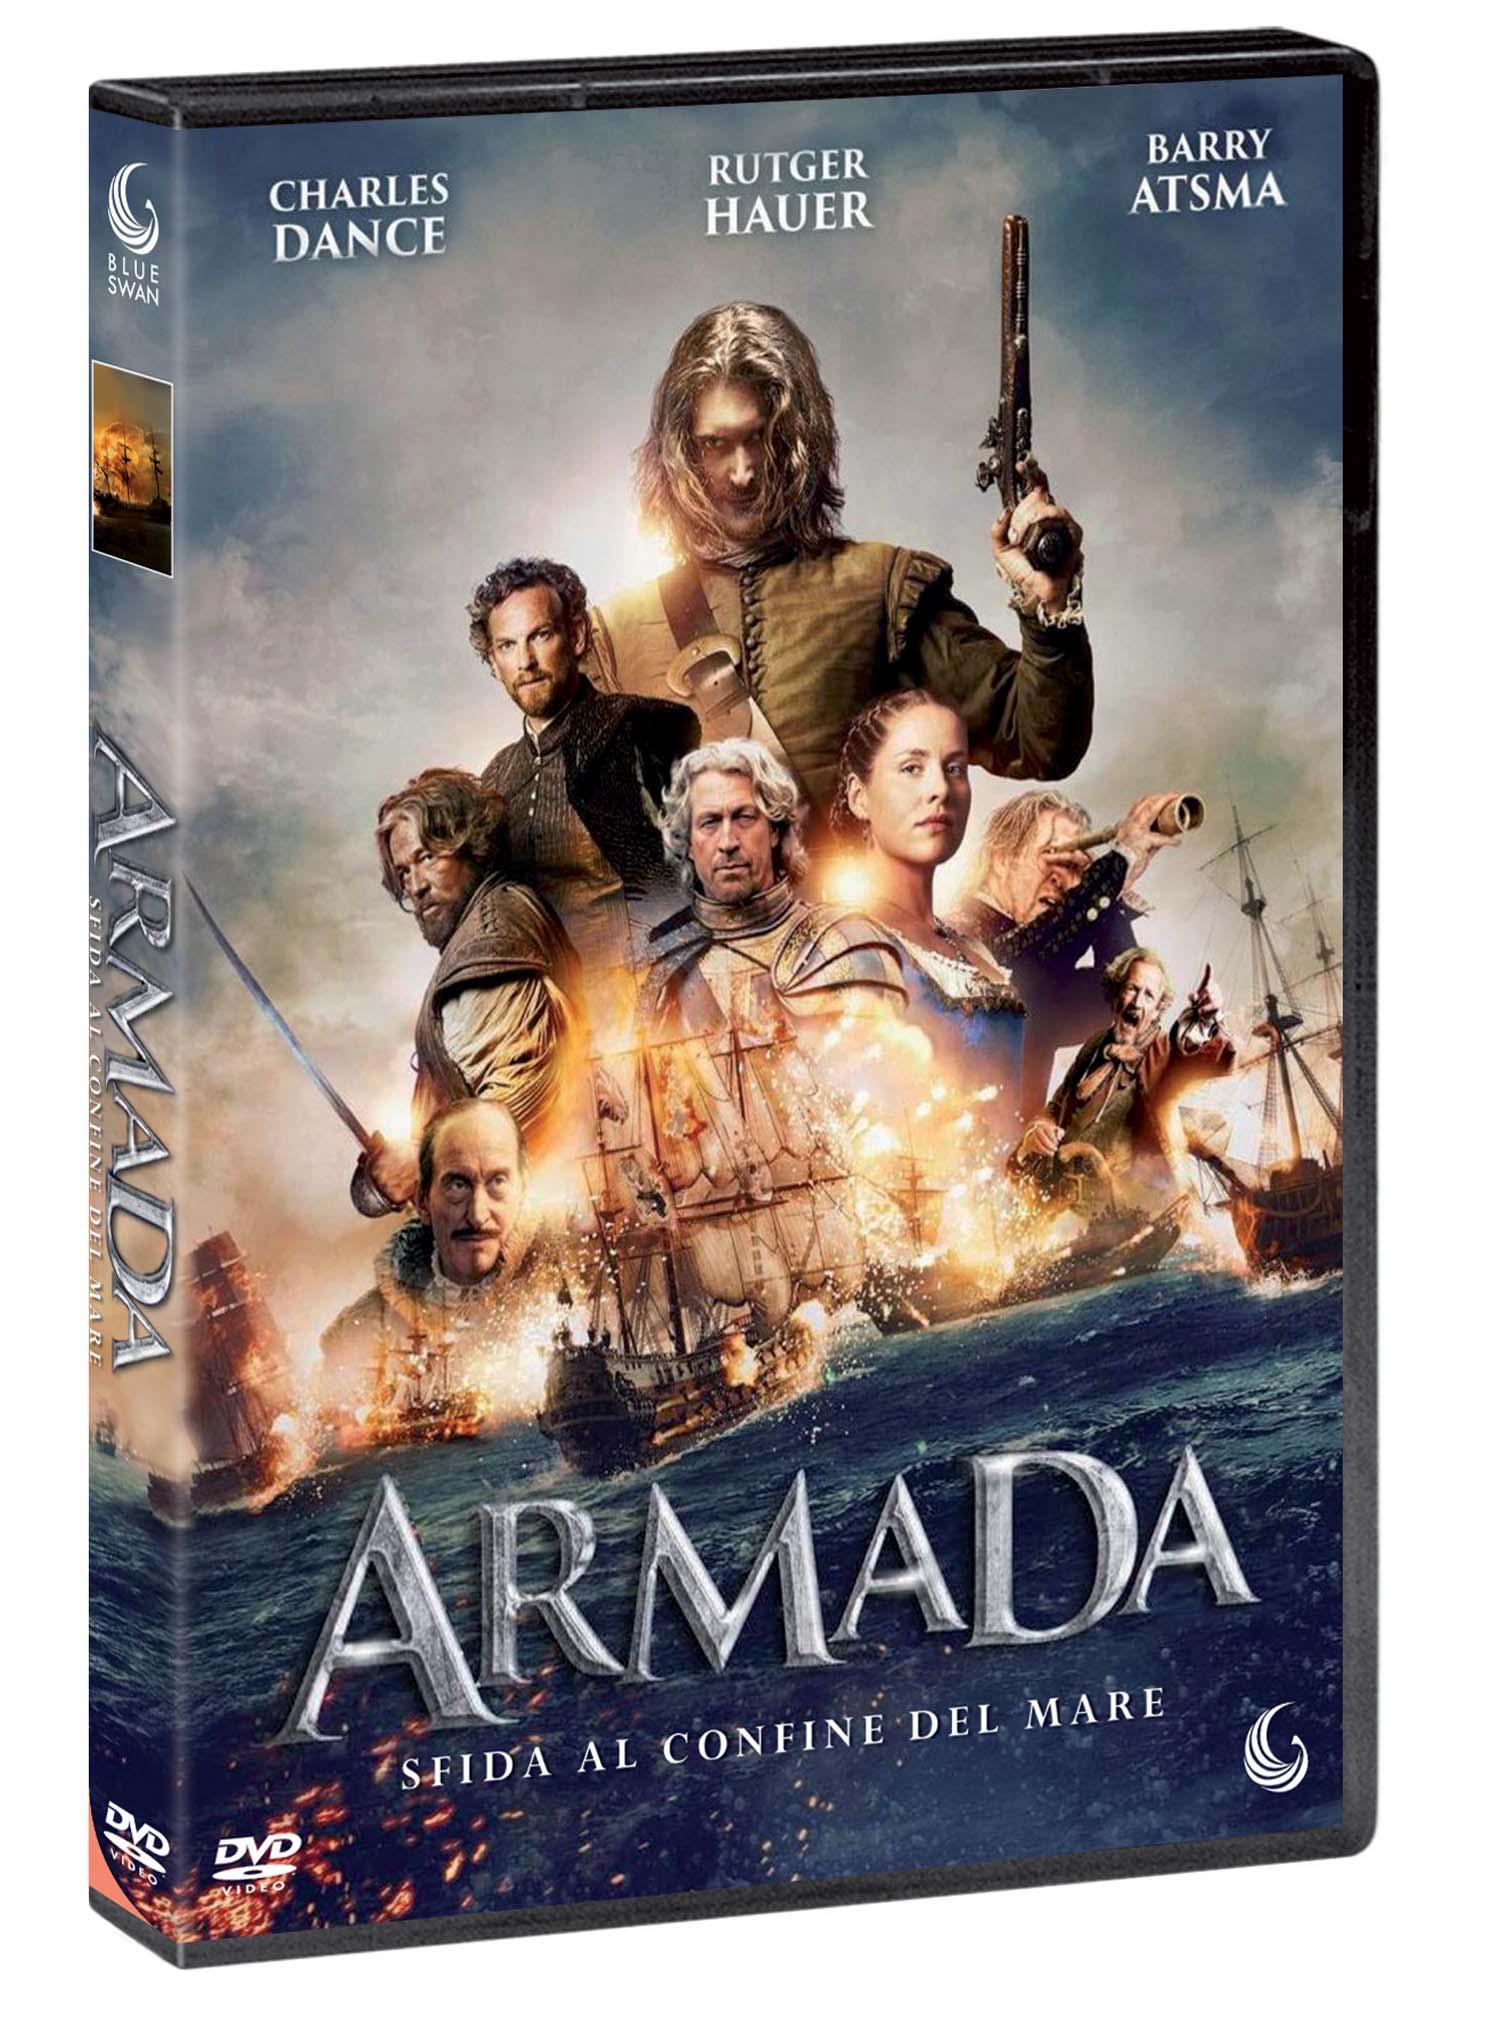 ARMADA (DVD)